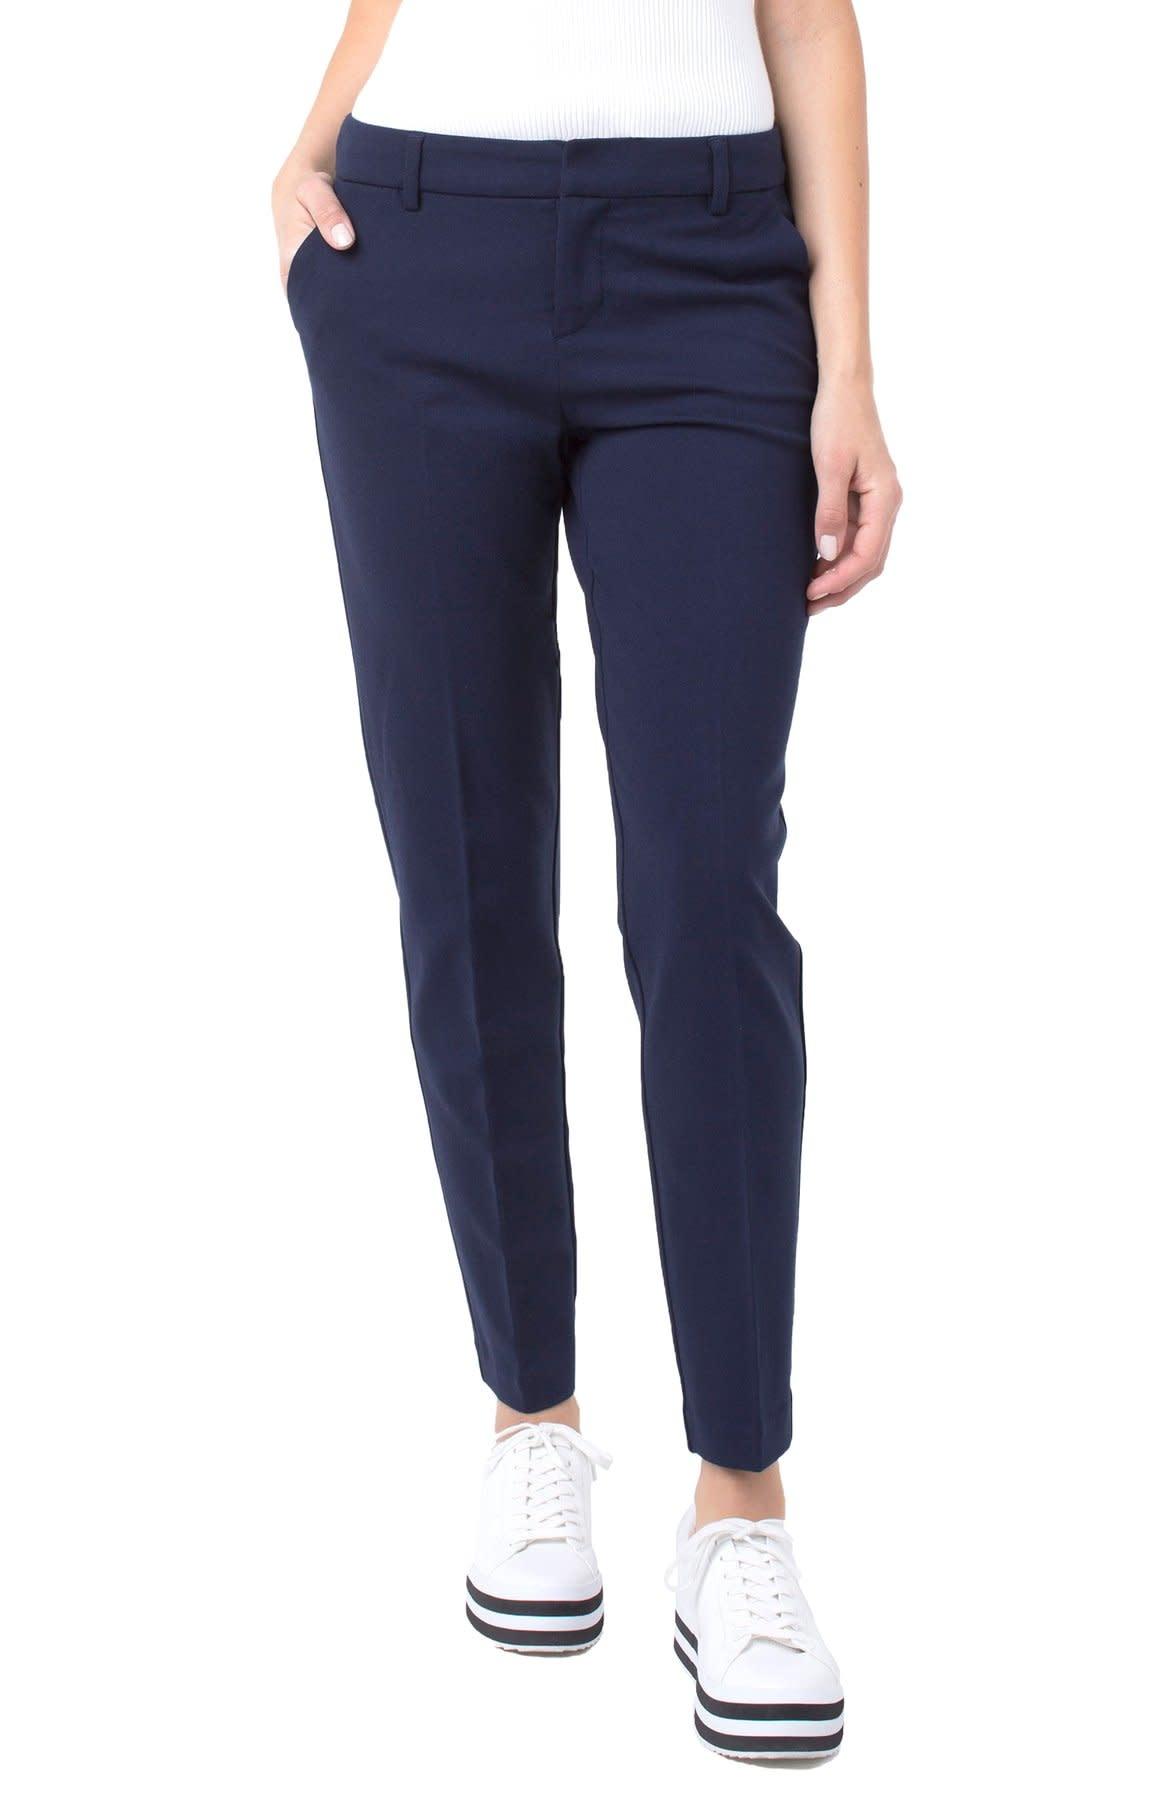 Kelsey Knit Trouser Super Stretch Ponte